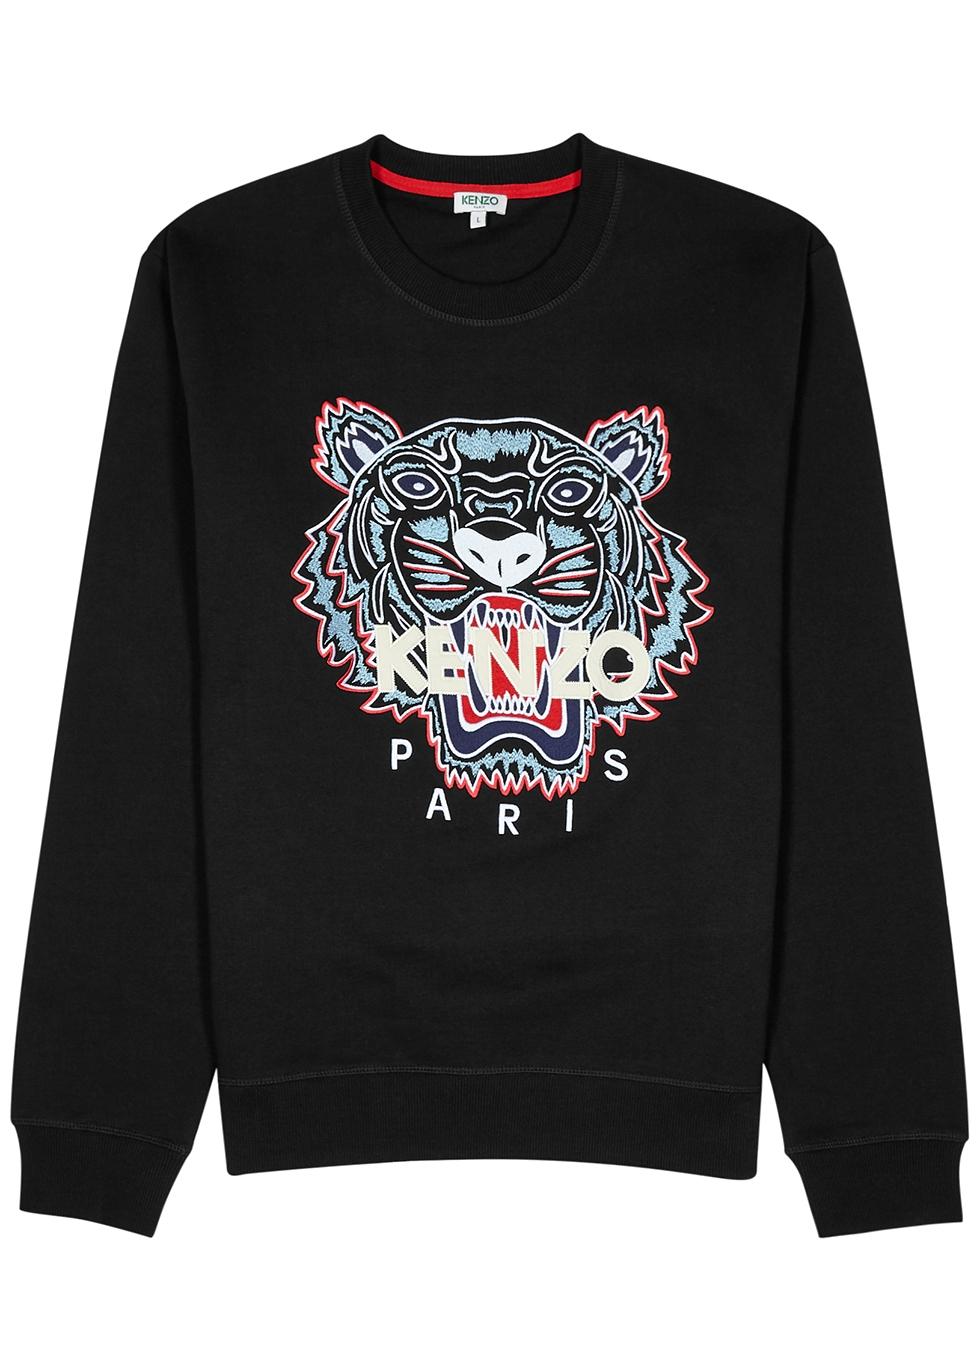 Kenzo Black tiger embroidered cotton sweatshirt Harvey Nichols